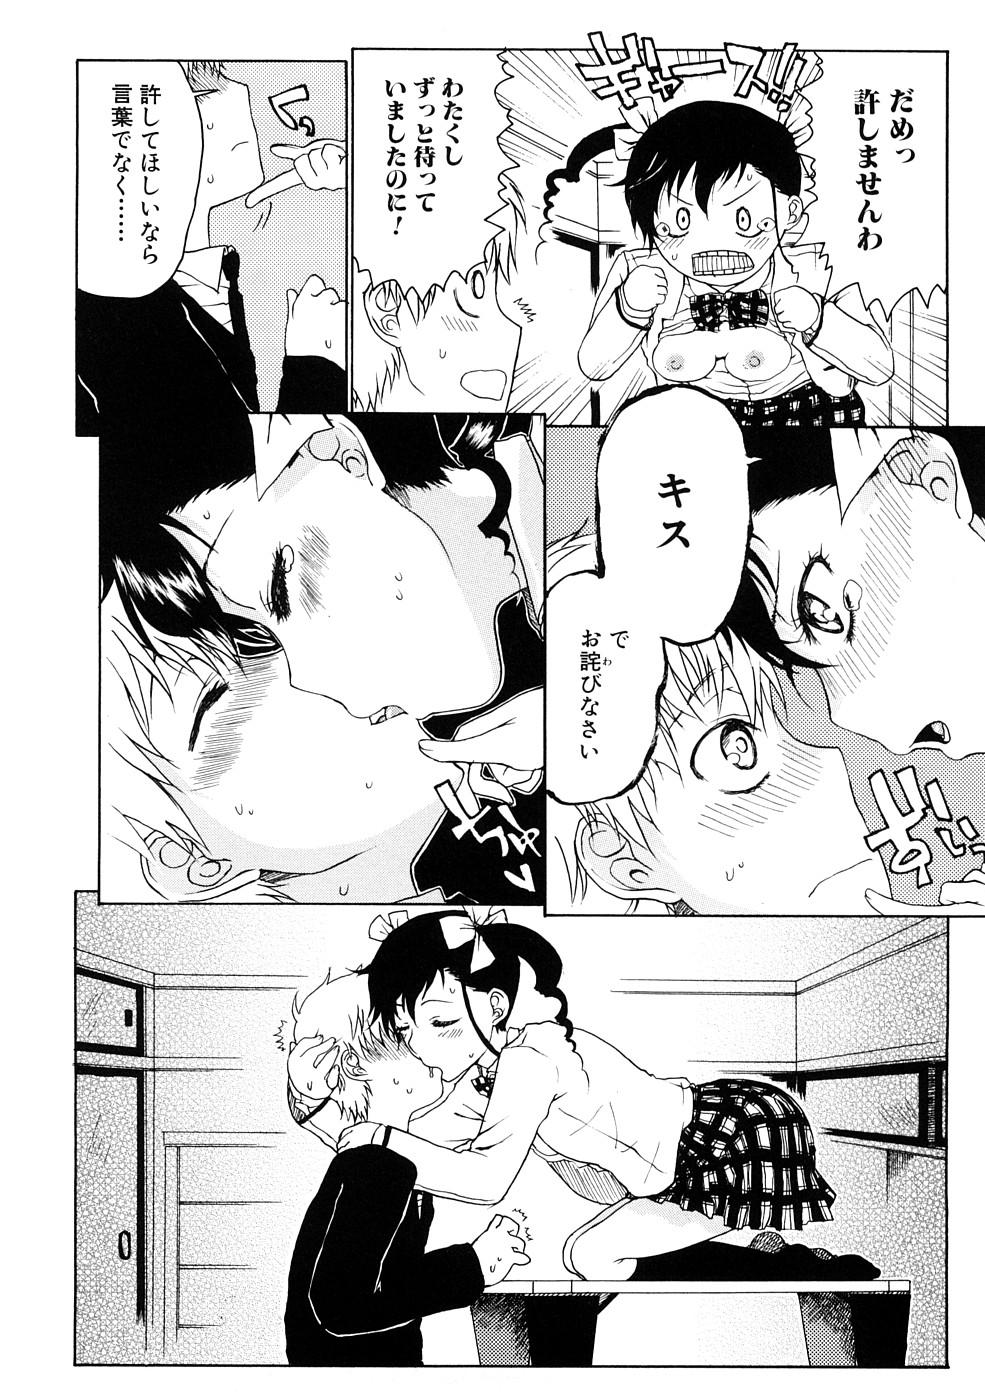 Ecchi de Jibunkatte de Kawaii Ko 41